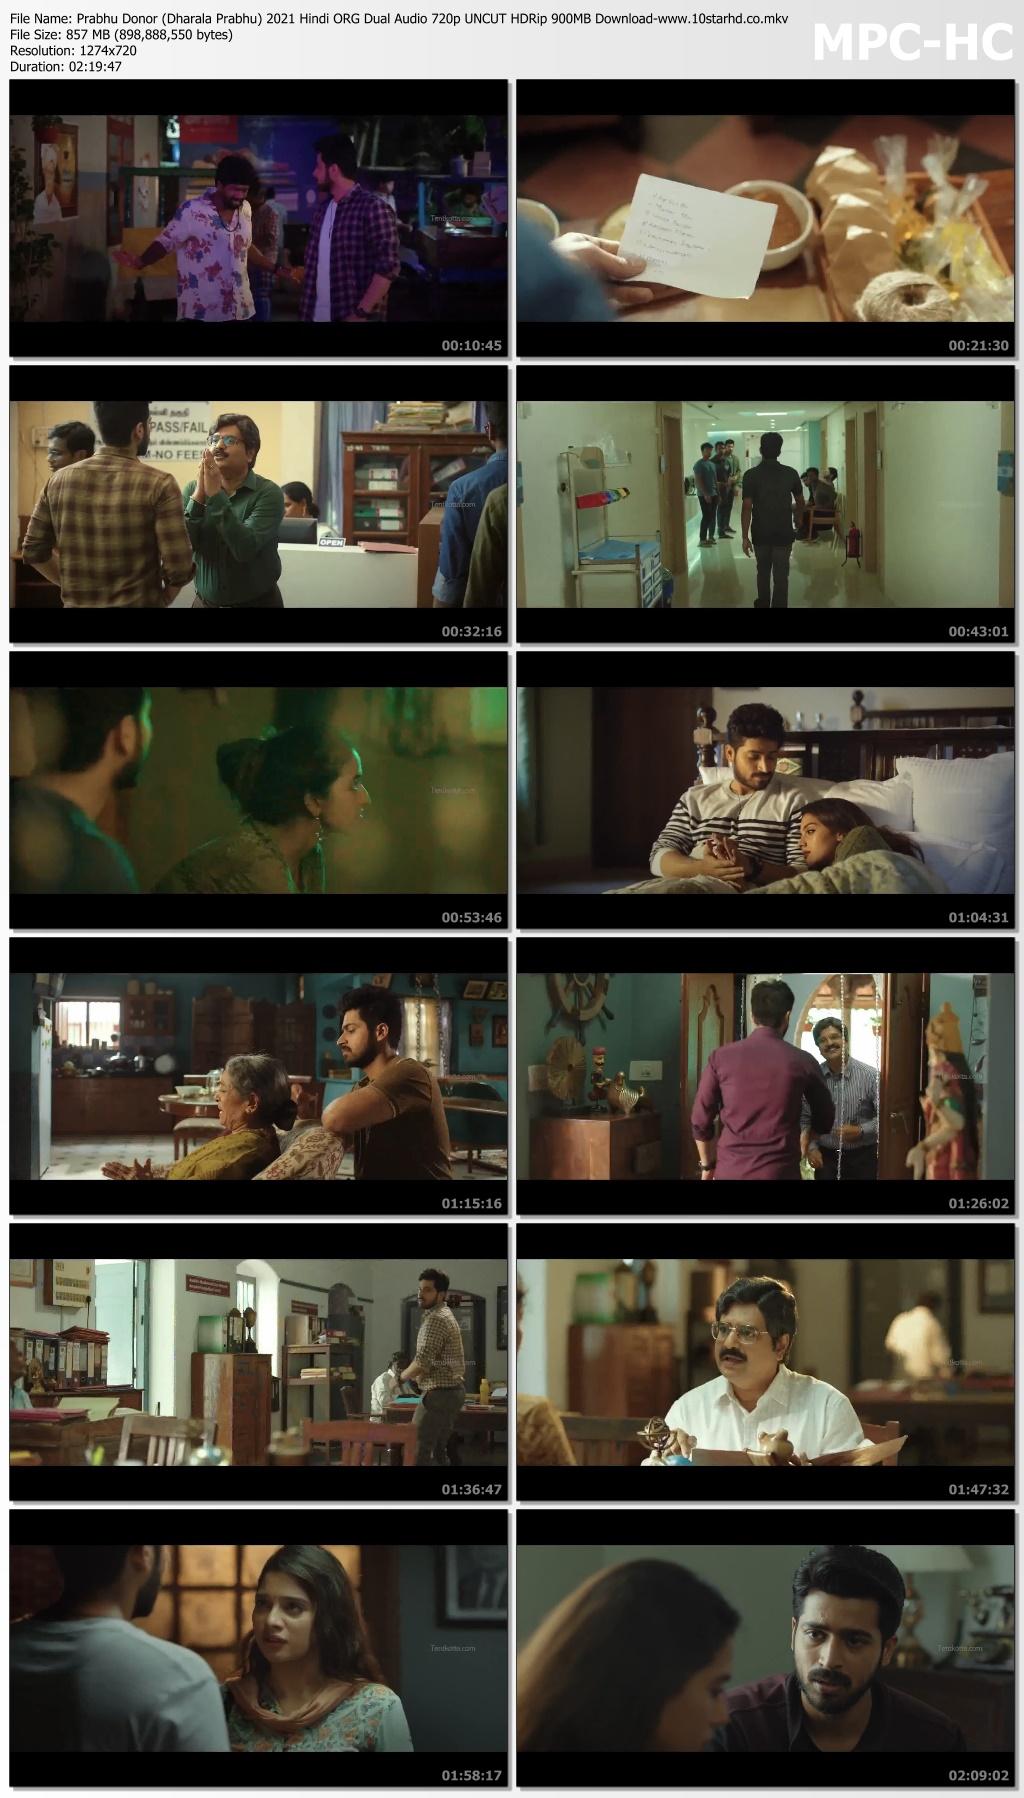 Prabhu Donor - Dharala Prabhu Screen Shot 2